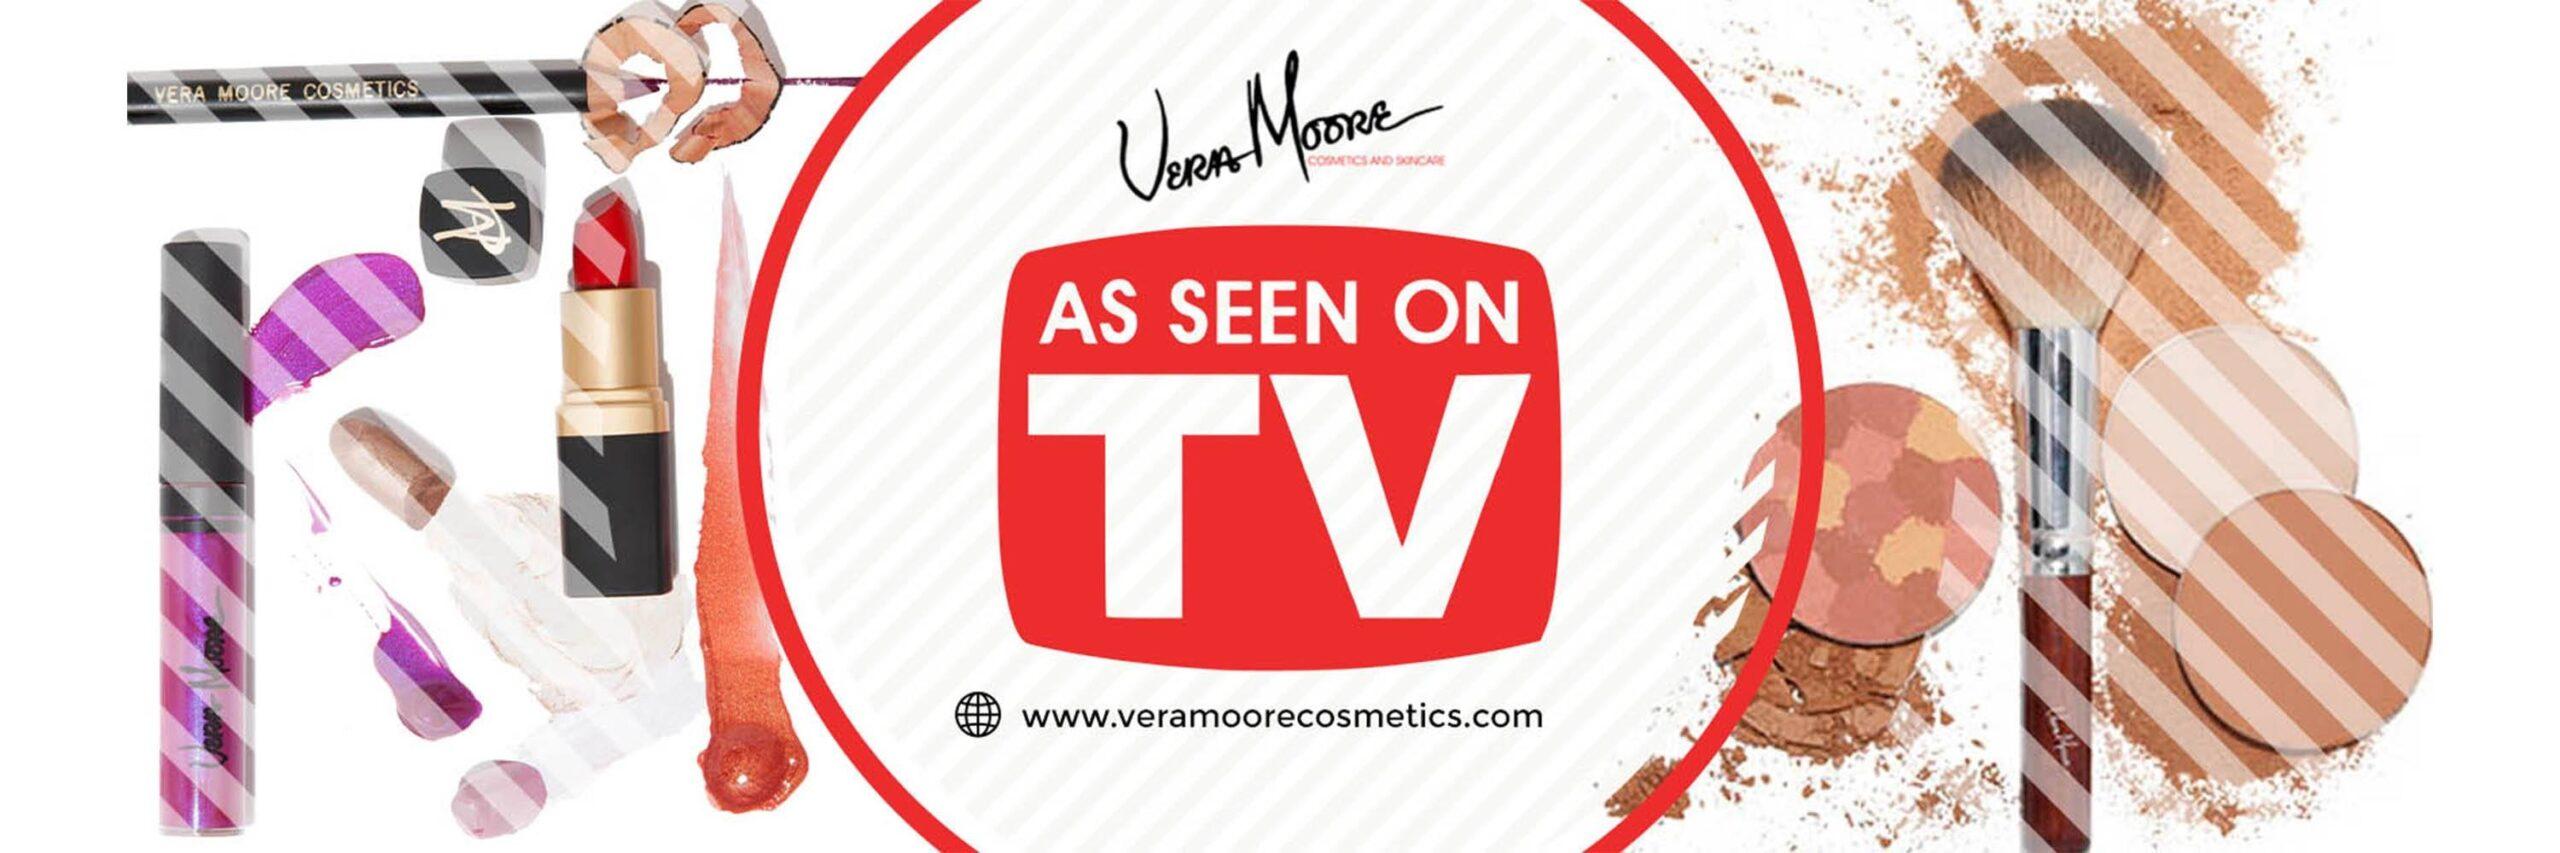 Vera Moore Cosmetics and Skincare